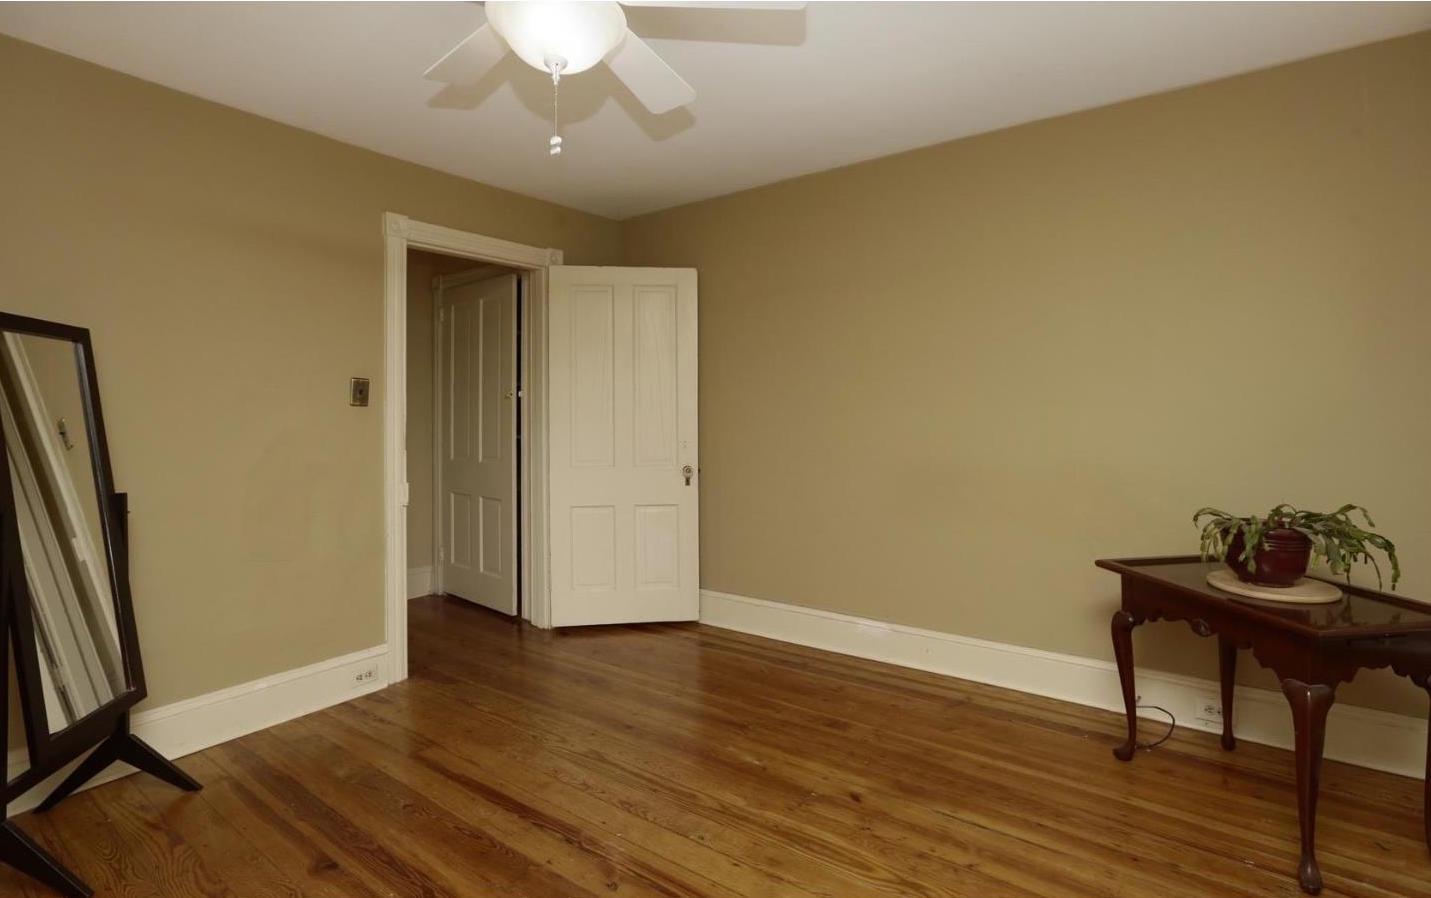 lawnton bedroom 3.jpeg